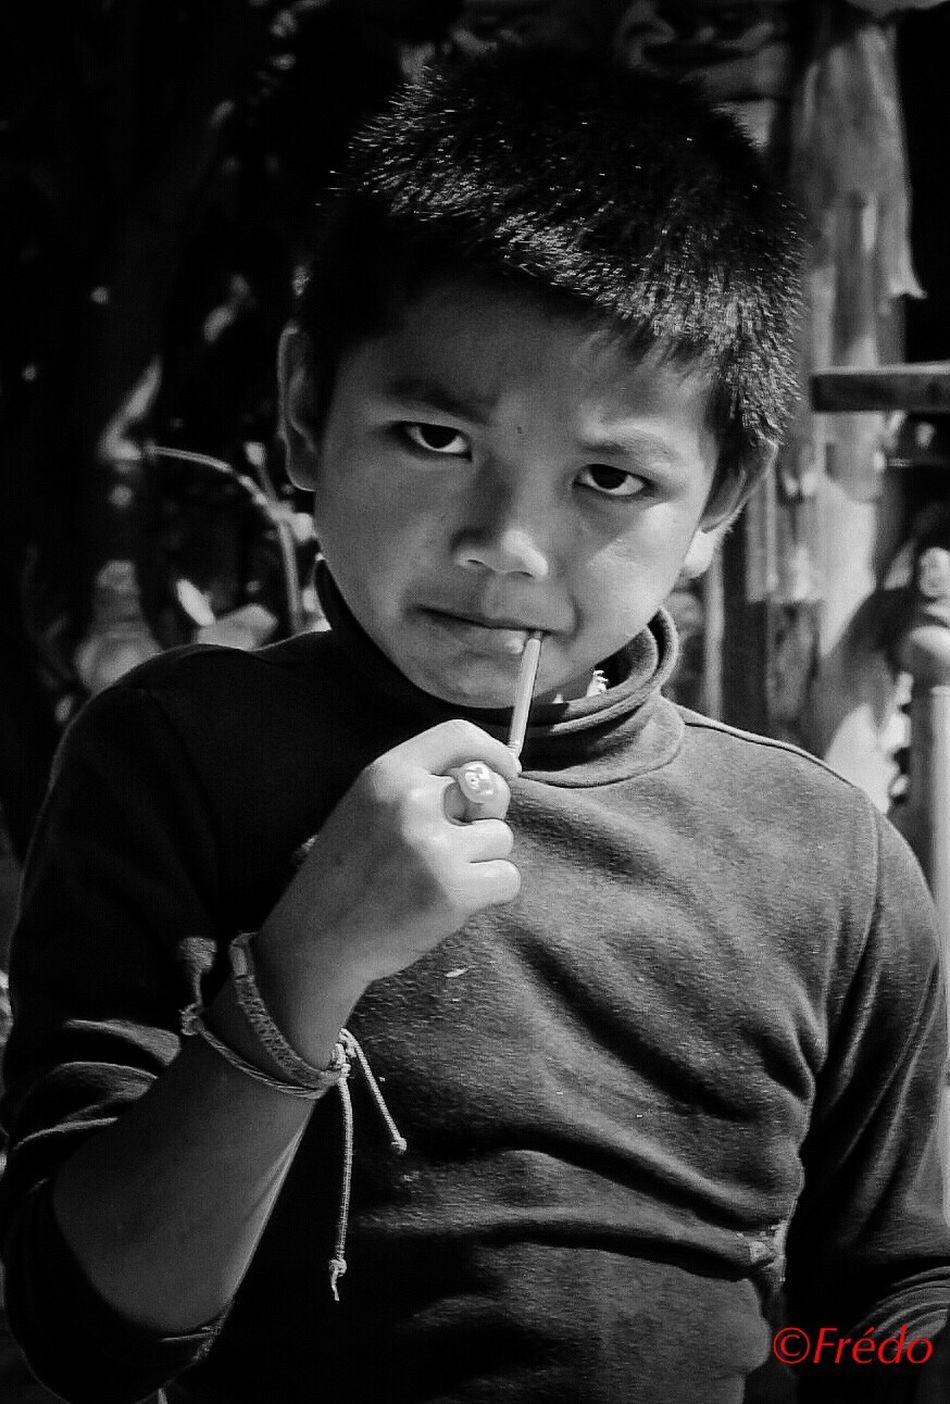 The sight Portrait Streetphoto_color EyeEm Best Shots EyeEmBestPics Street Photos😄📷🏫⛪🚒🚐🚲⚠ Eyeemphotography EyeEm Gallery Eye4photography Colorful Photo Eyem Best Shots Eyem Gallery Photooftheday EyeEm Best Edits Thailand_allshots #Chiang Mai Human Kid Kids Being Kids Thaïlande Street Photography Kidsphotography